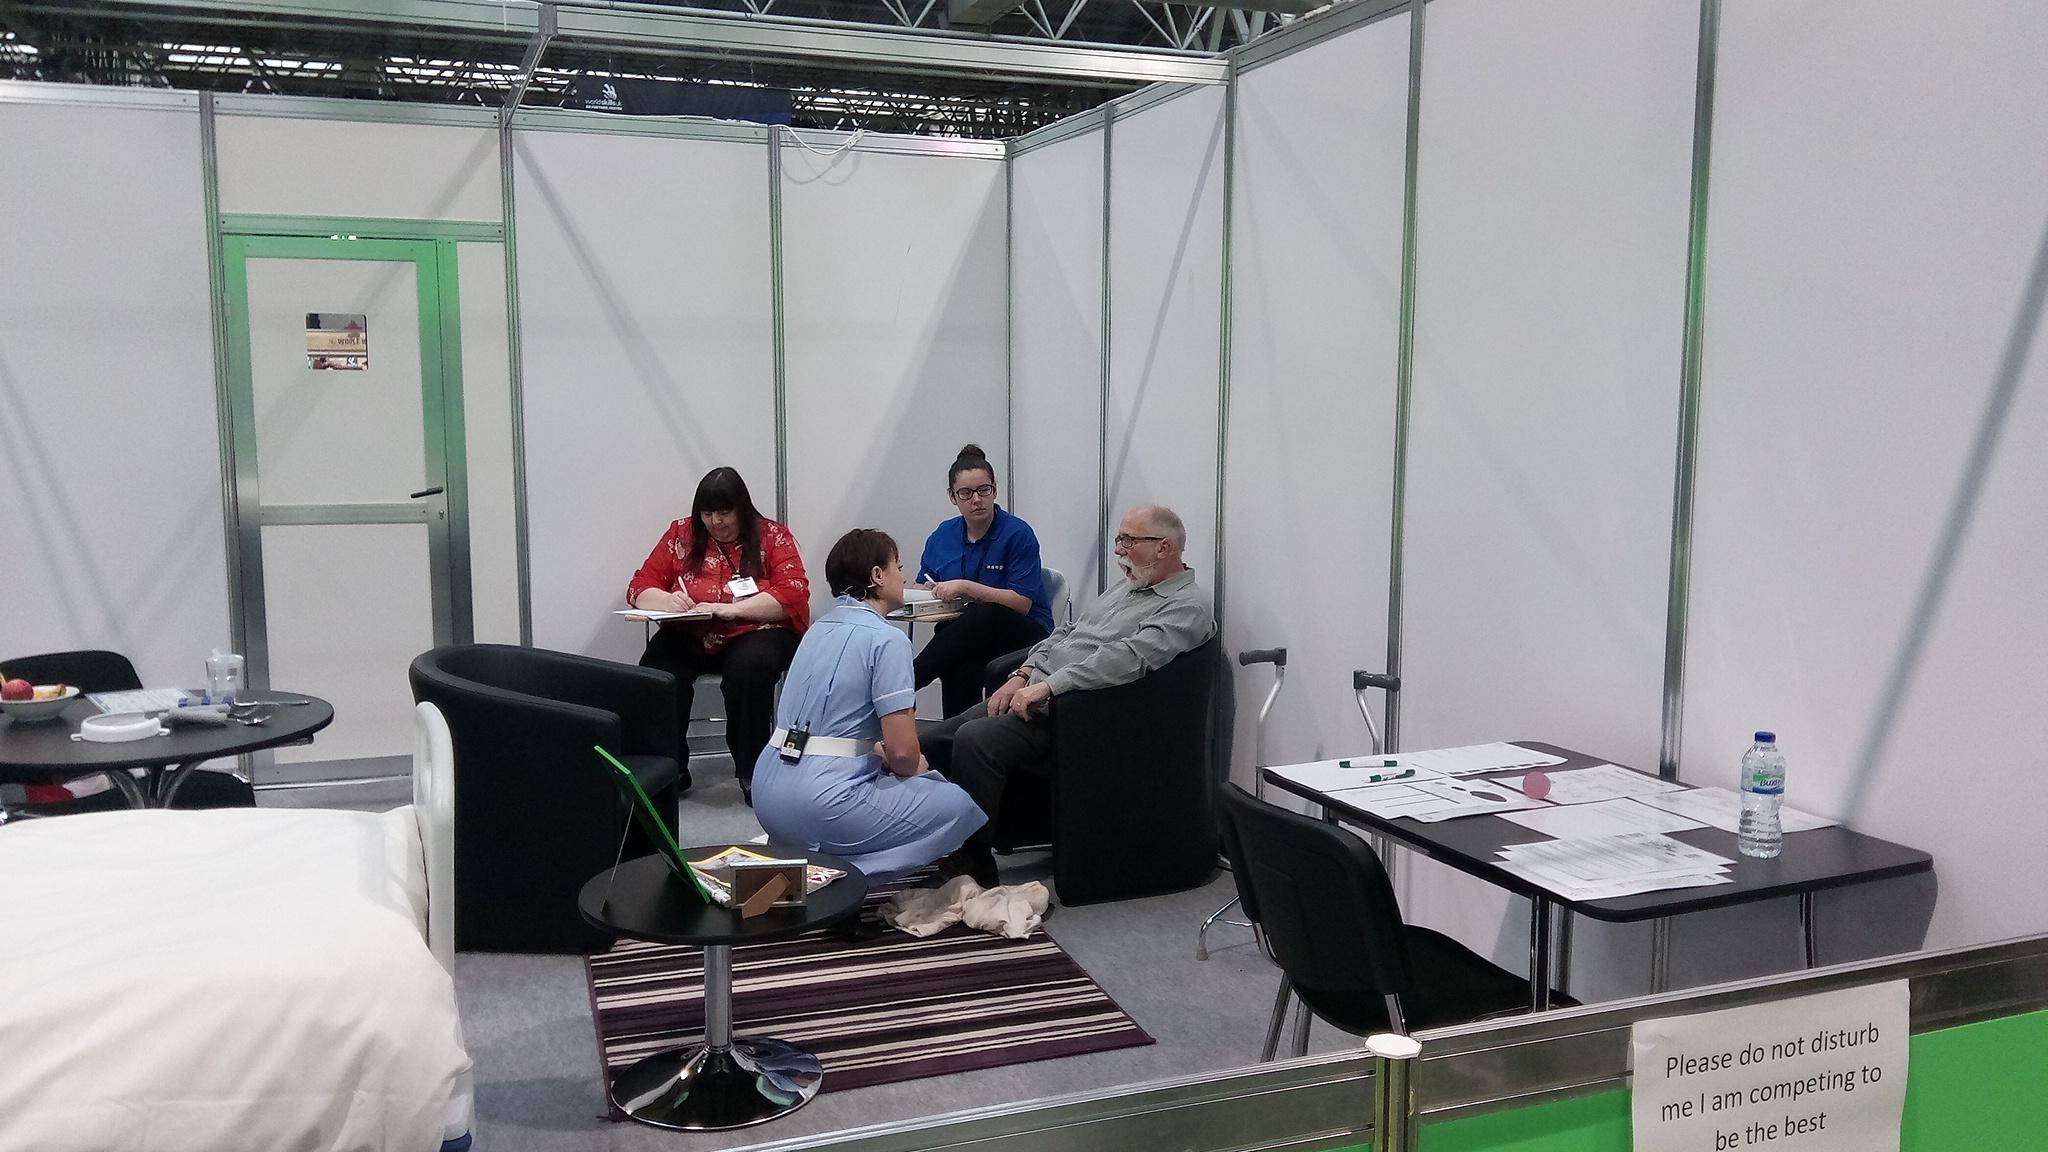 WorldSkills 2017 images